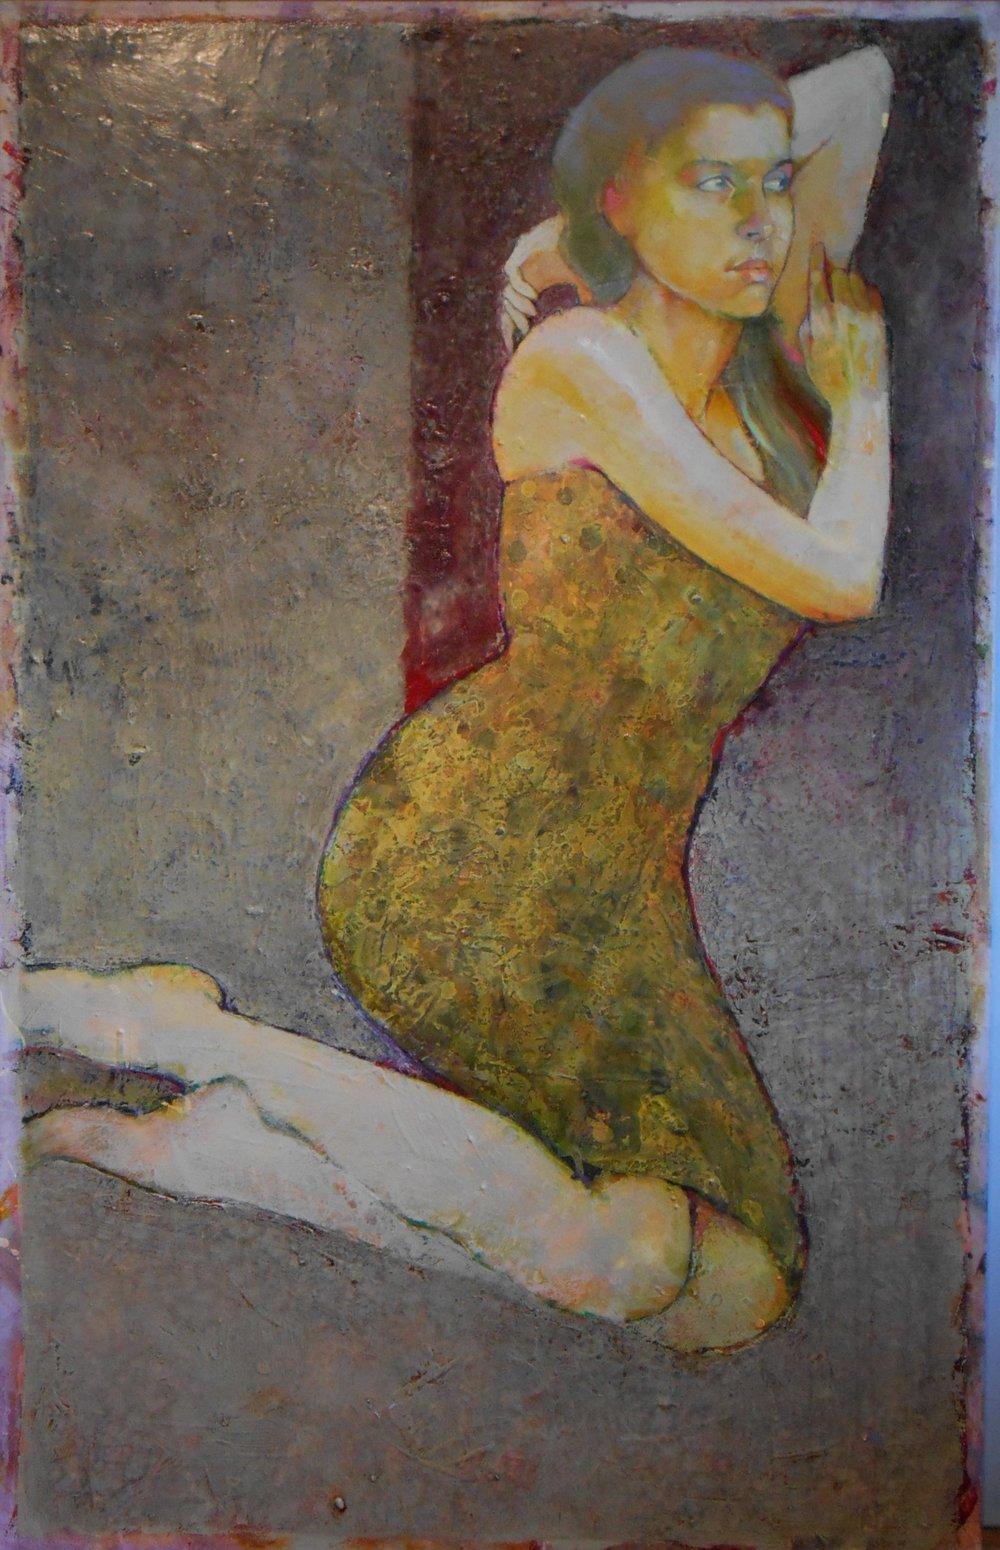 Paint 8. When_Oil on Canvas_ 2010_50x30.JPG